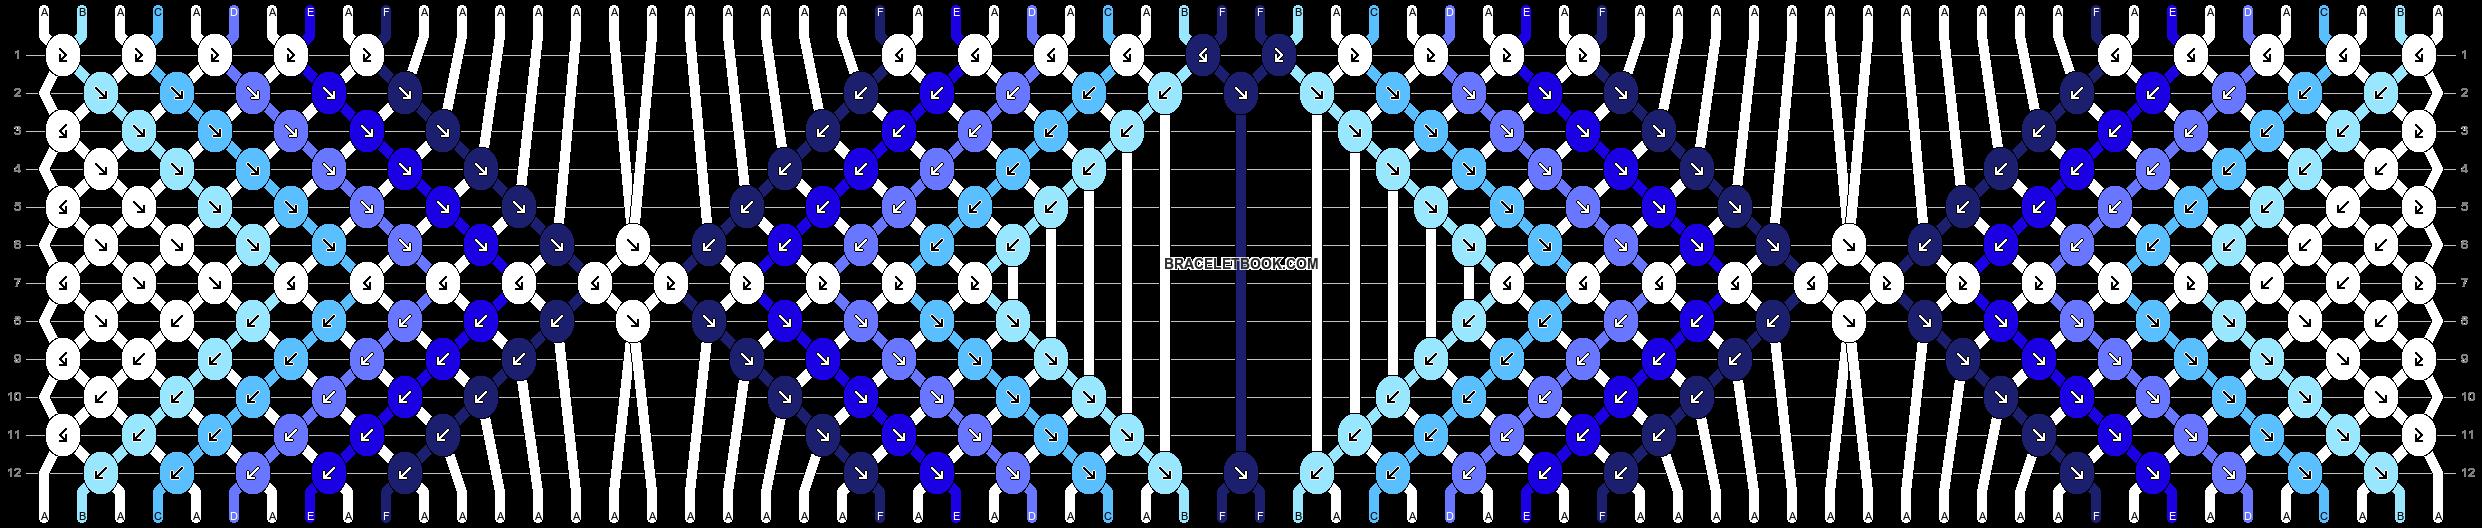 Normal pattern #40229 pattern